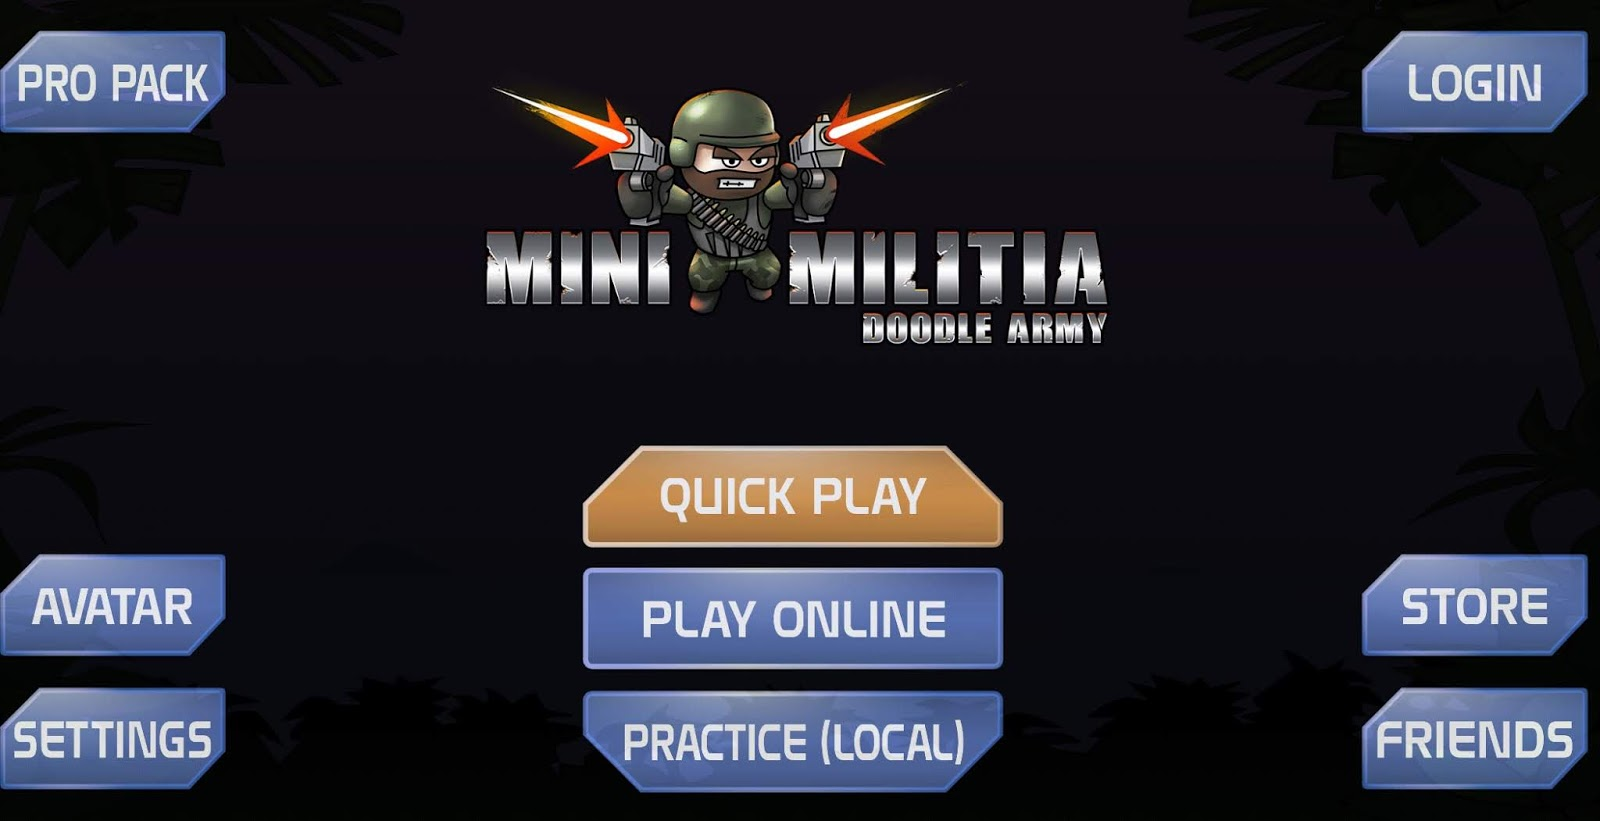 Mini Militia - Doodle Army 2 Mod Apk Version 4 2 8 Pro Pack